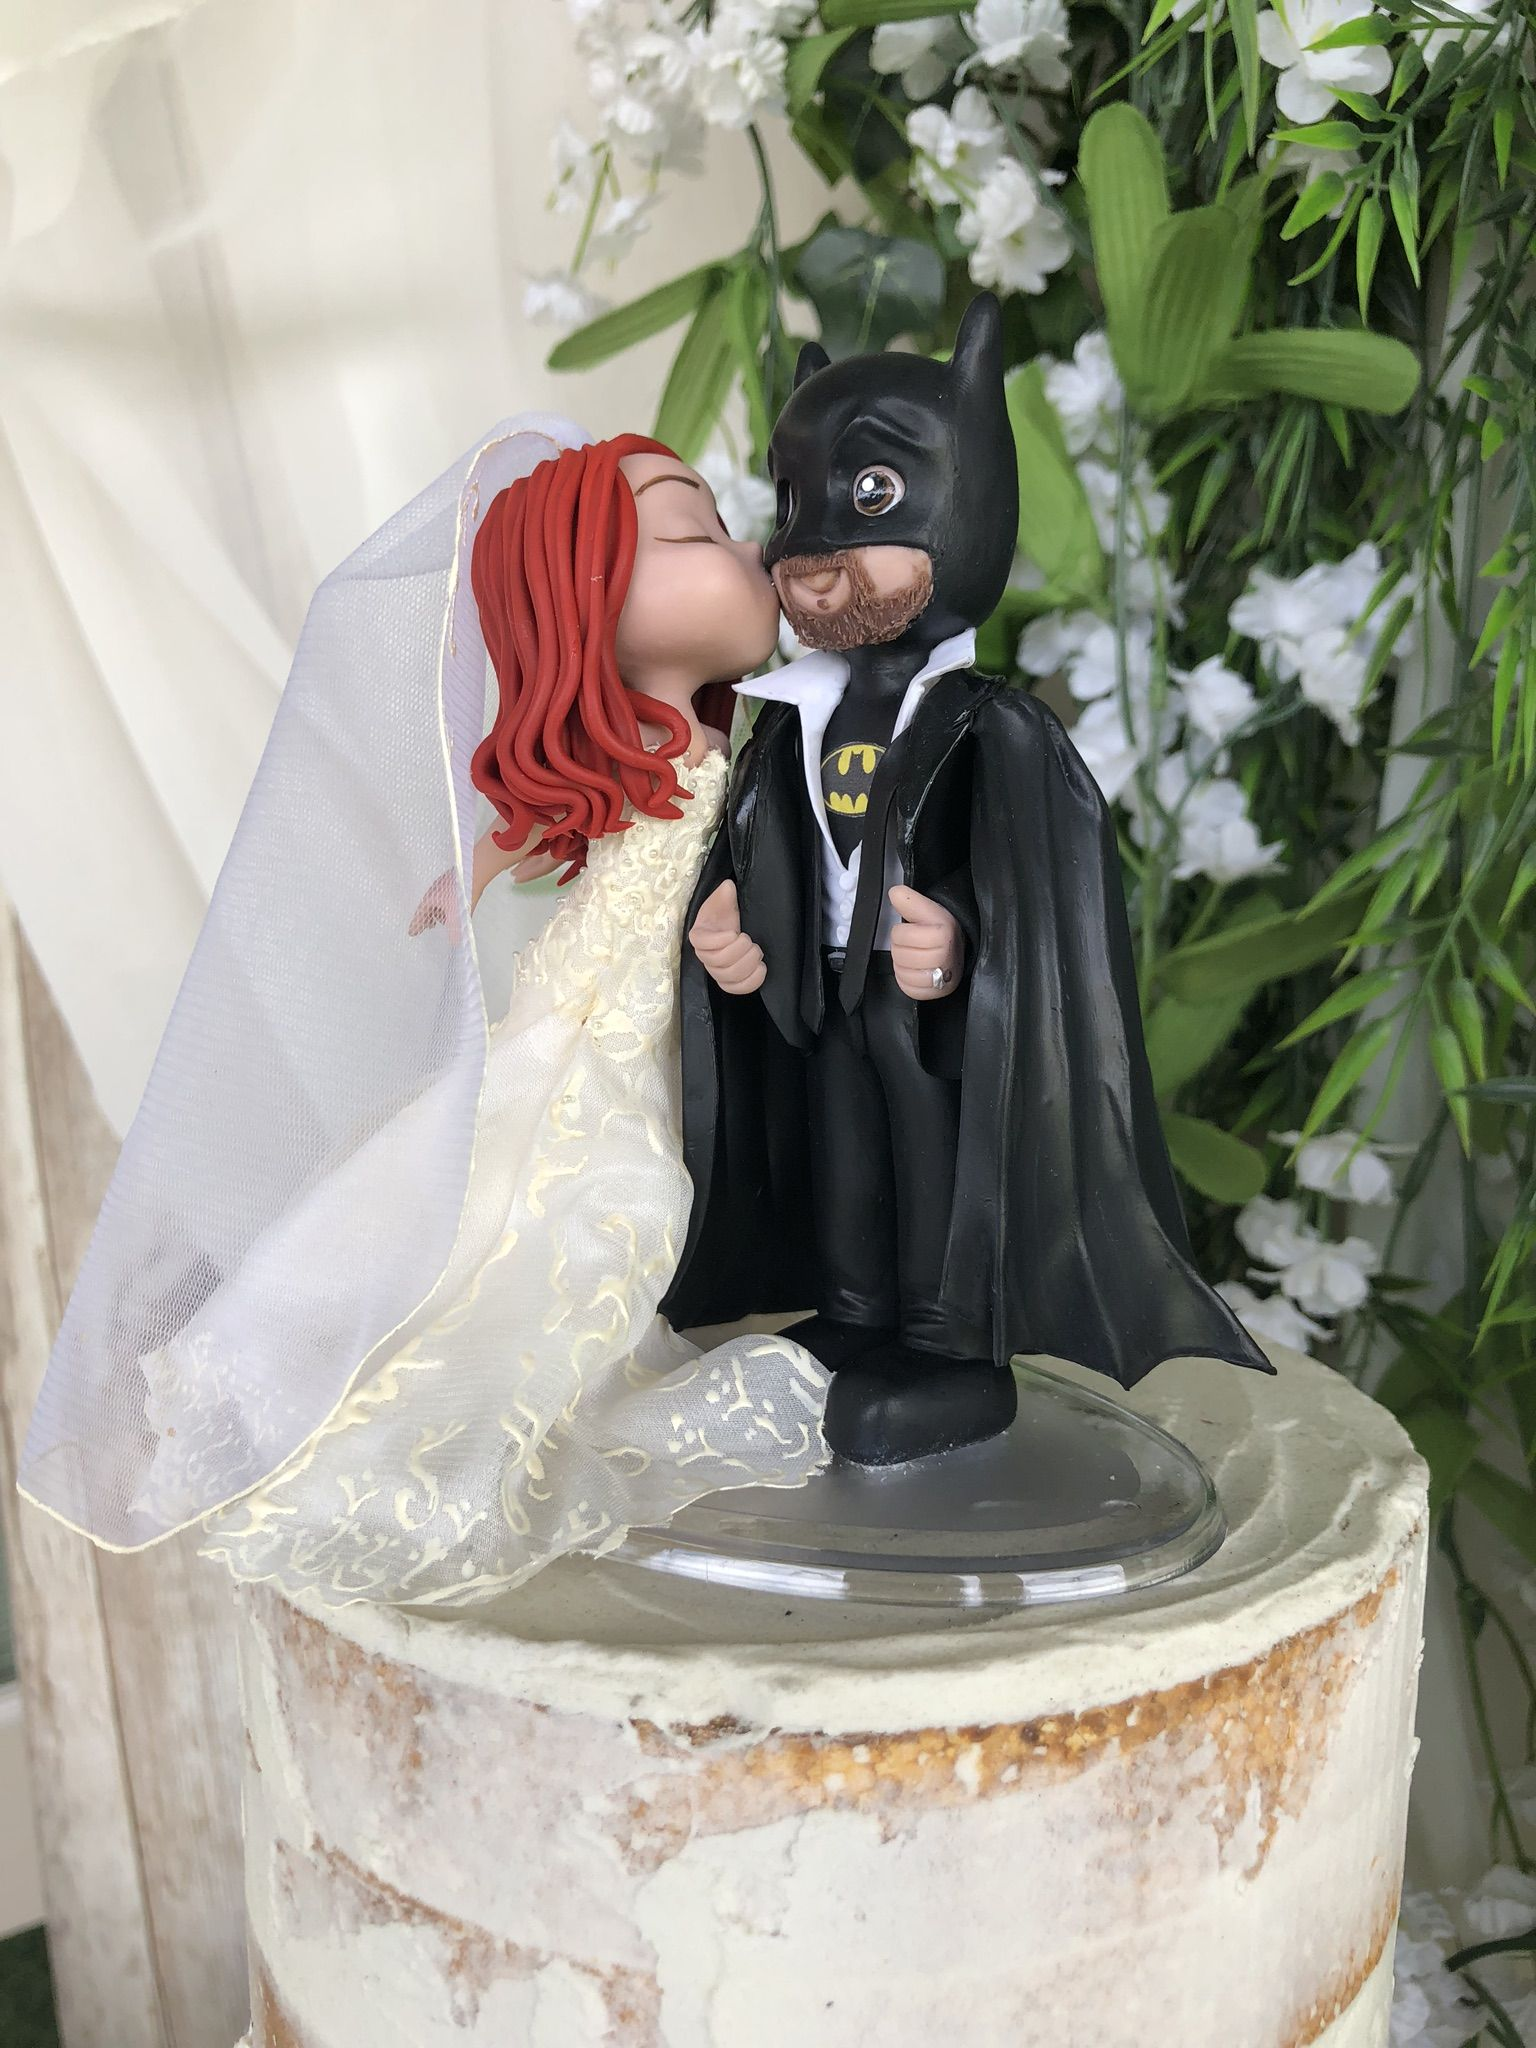 Custom Handcrafted Wedding Cake Topper Batman Wedding Batman Wedding Cake Topper Wedding Cake Topper Figurines